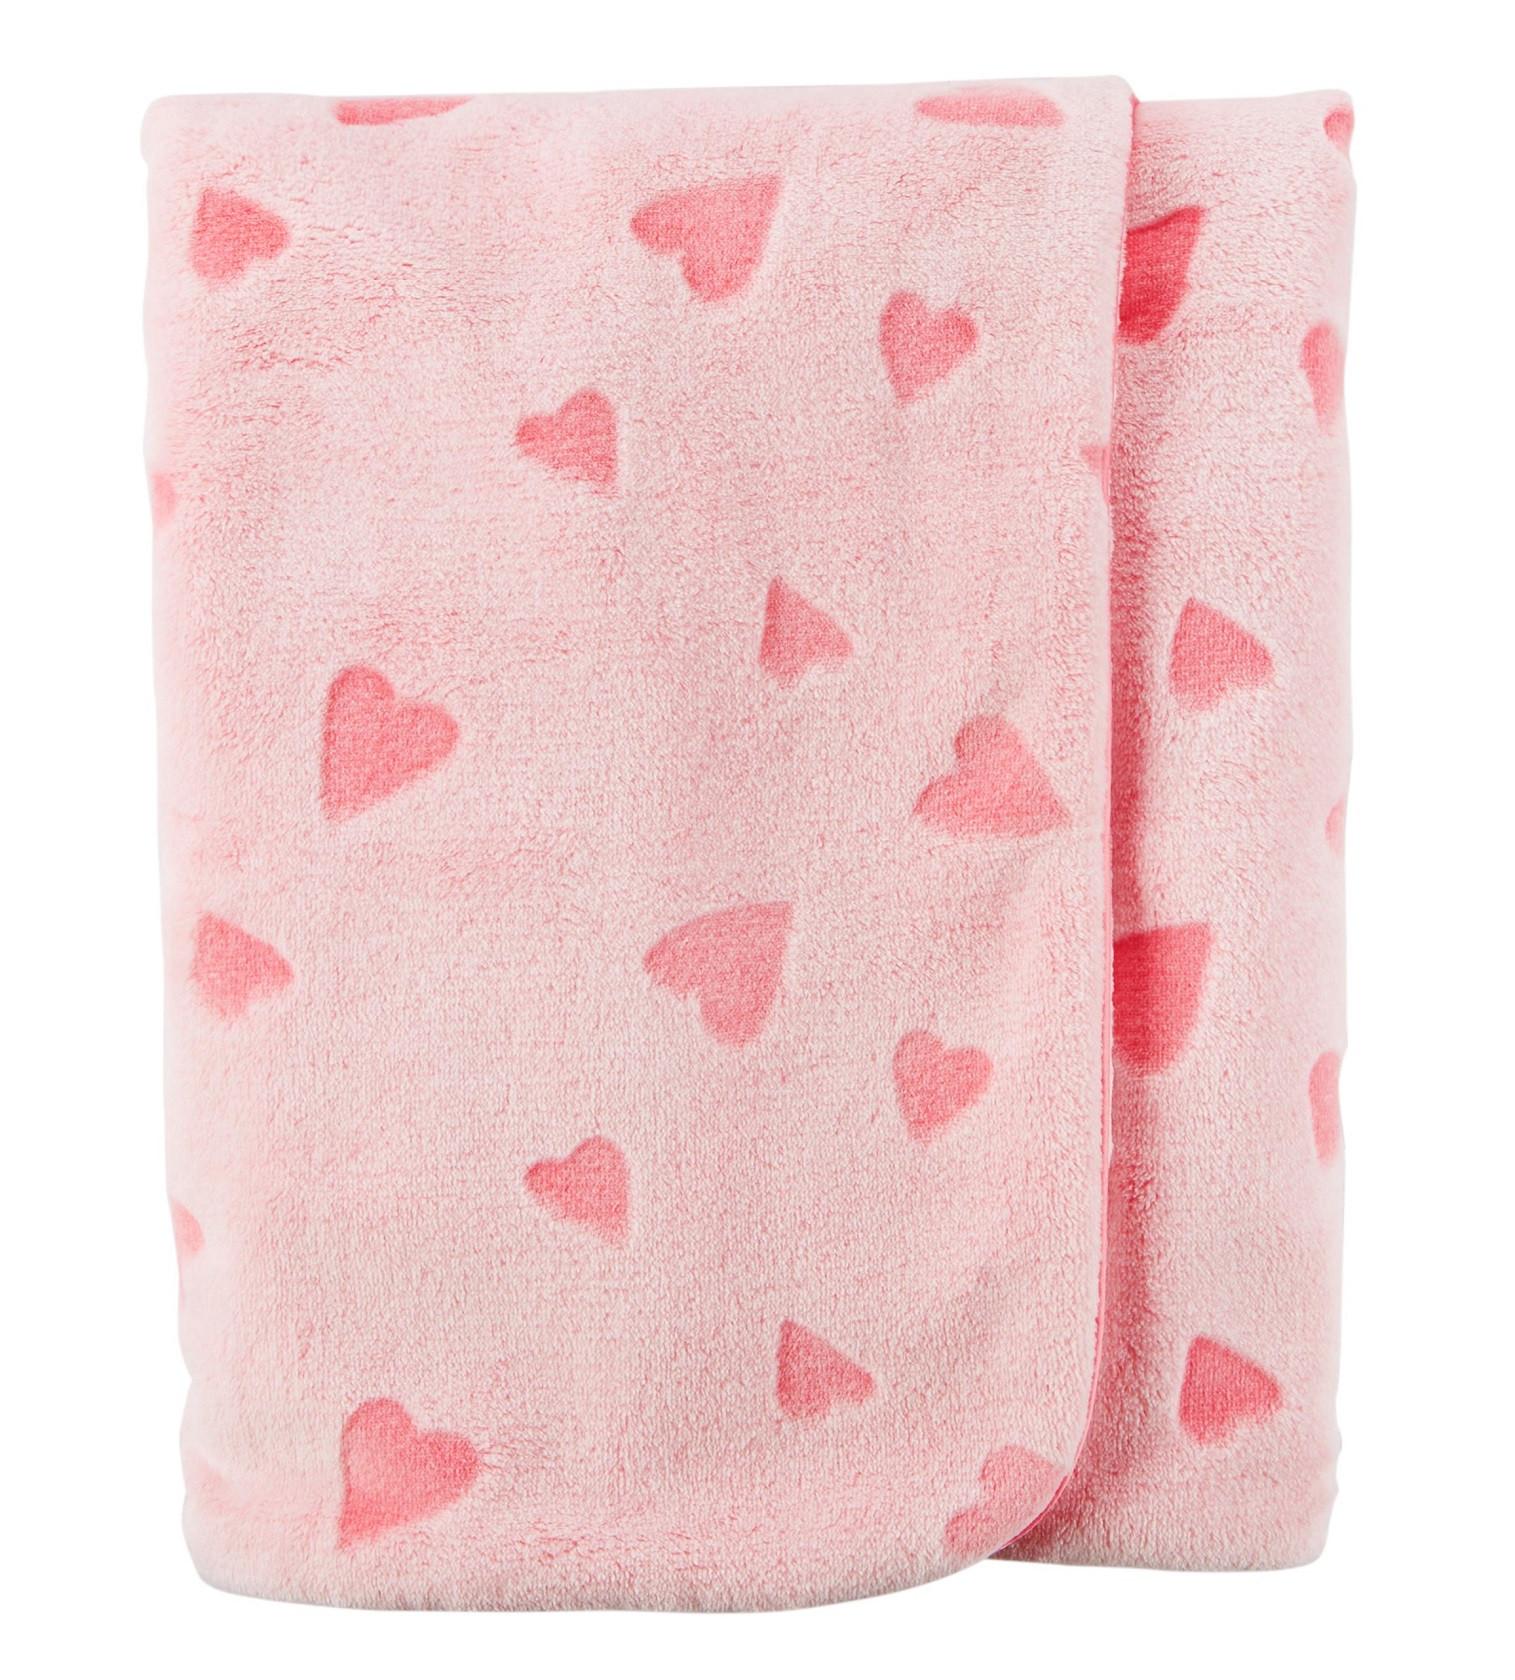 Купити Ковдра плюшева Carters Heart Plush Pink - фото 1